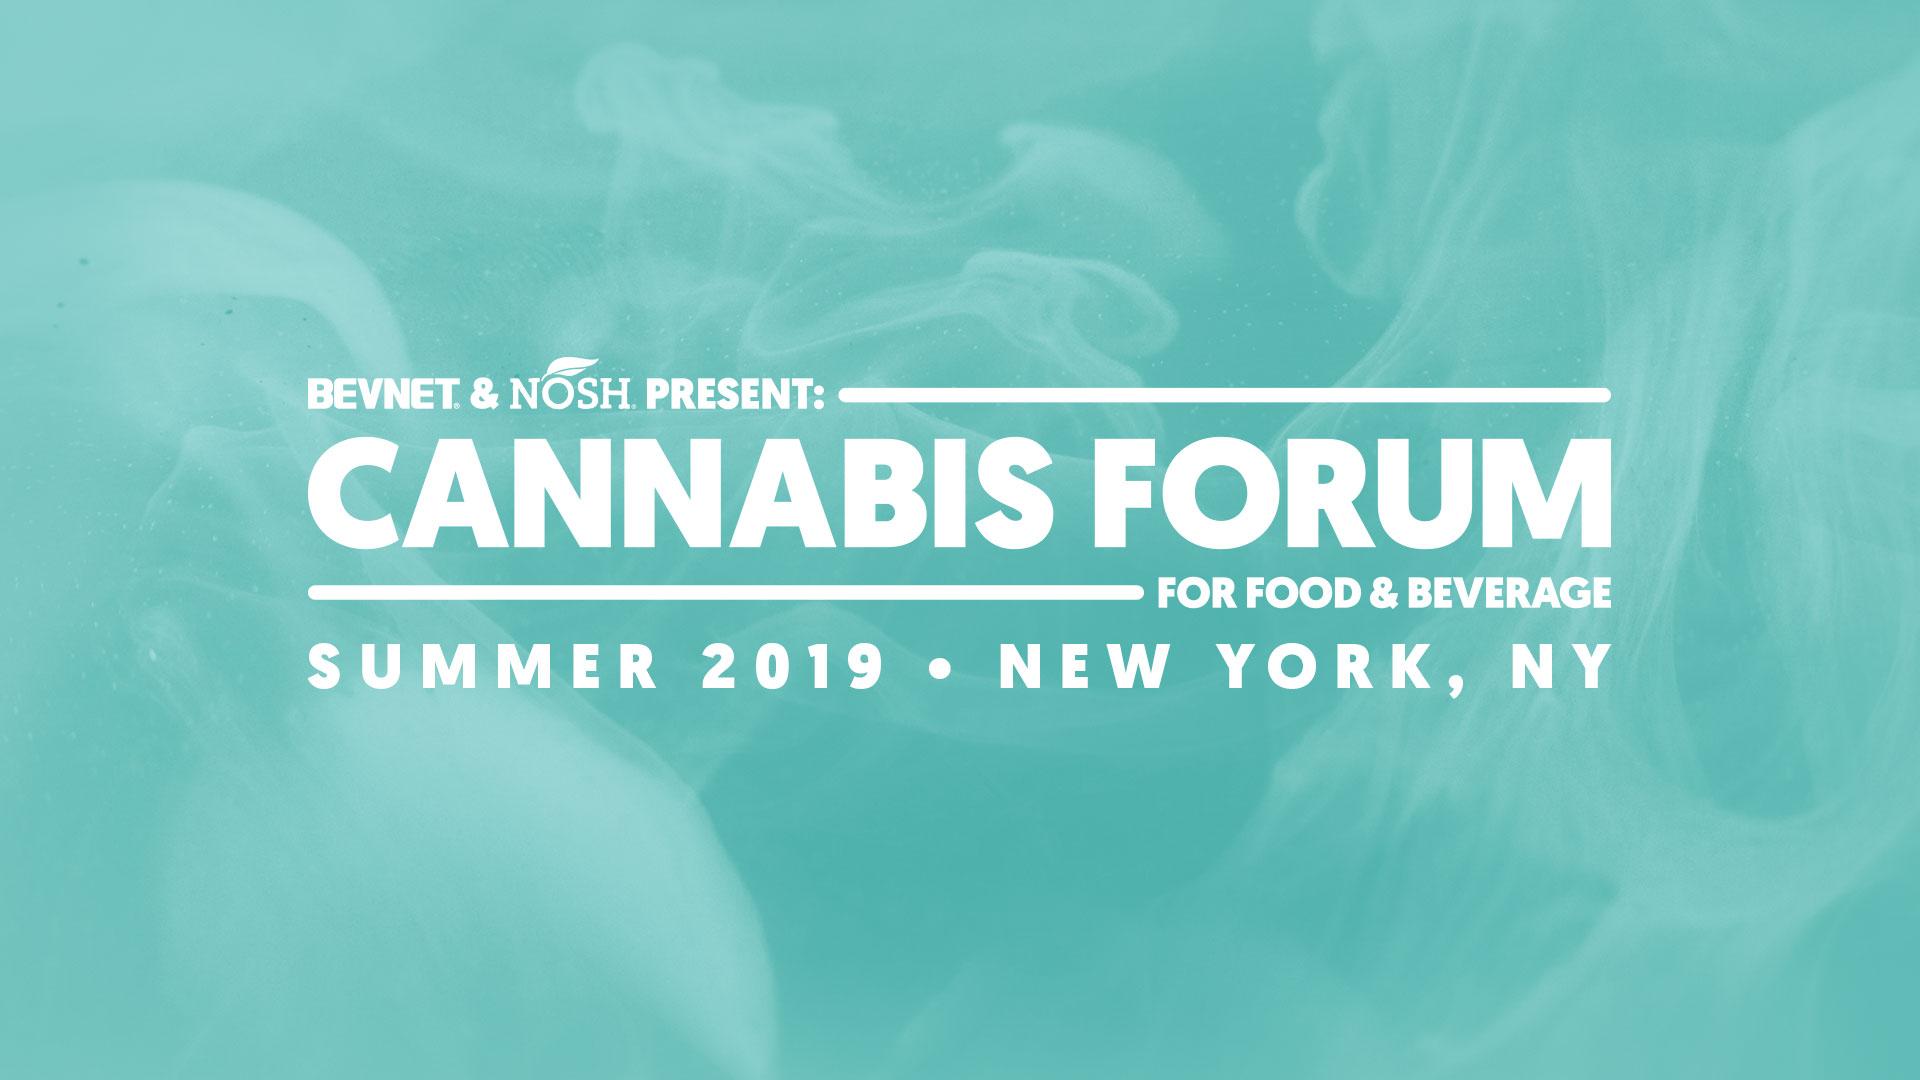 Cannabis Forum Summer 2019